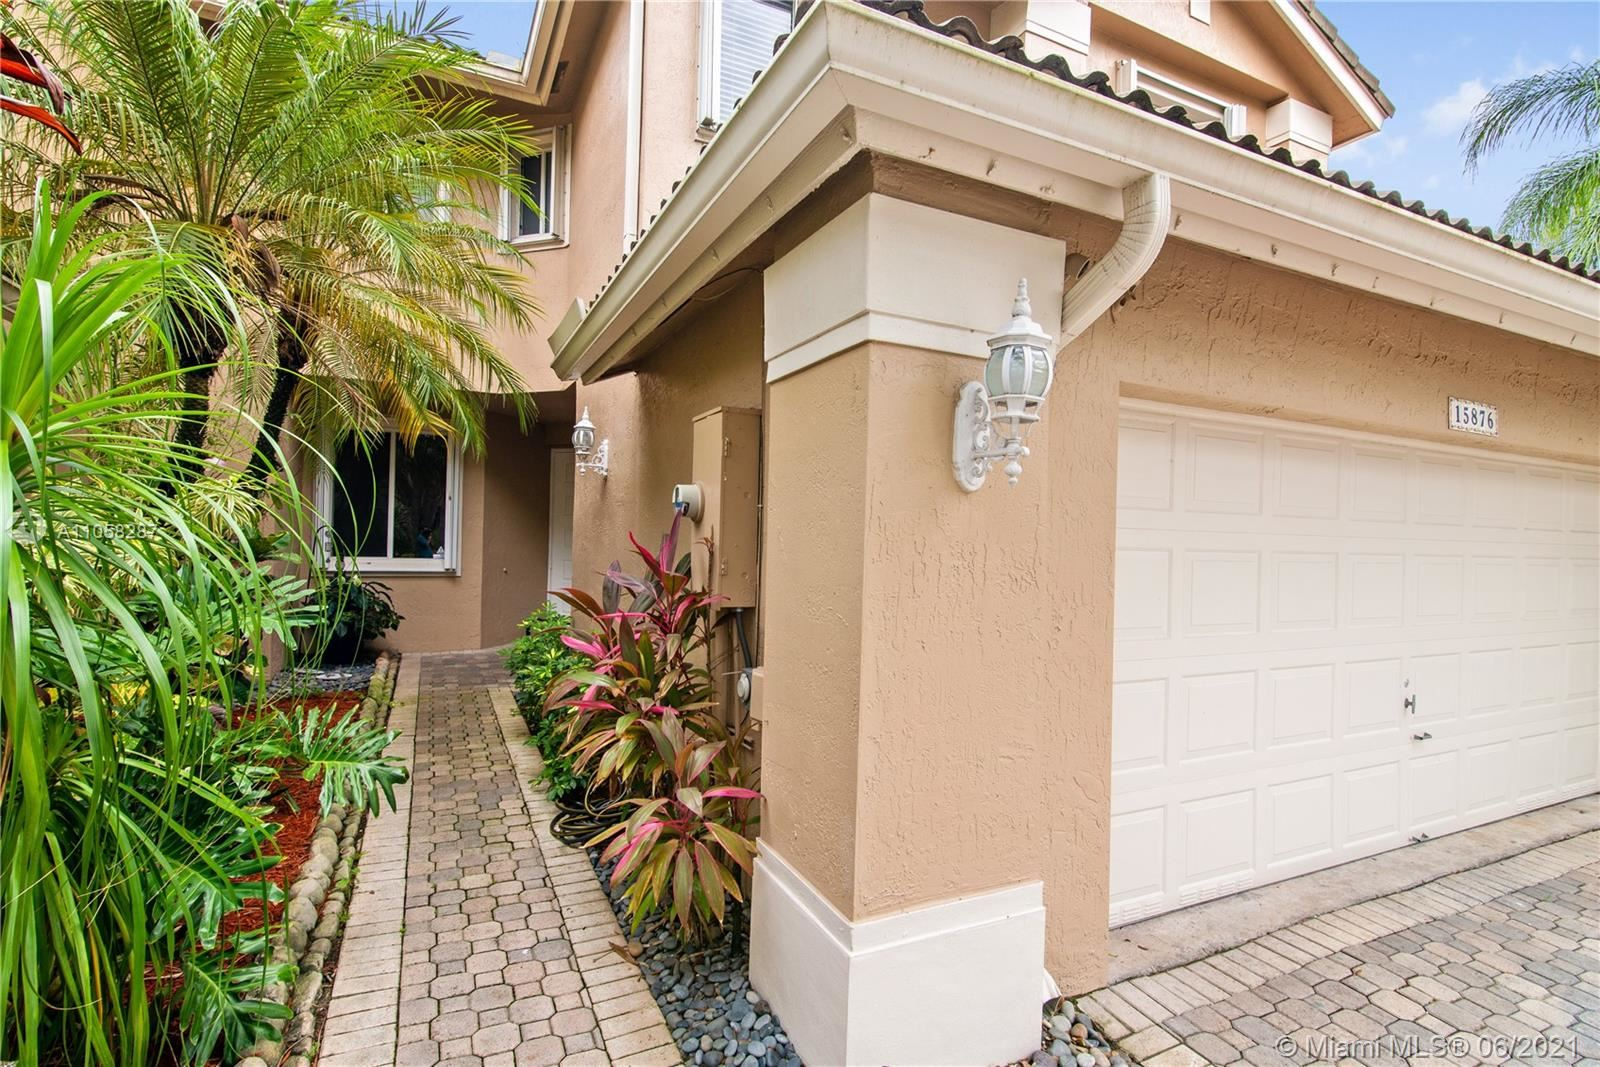 Photo of 15876 SW 12th St #15876, Pembroke Pines, FL 33027 (MLS # A11058287)